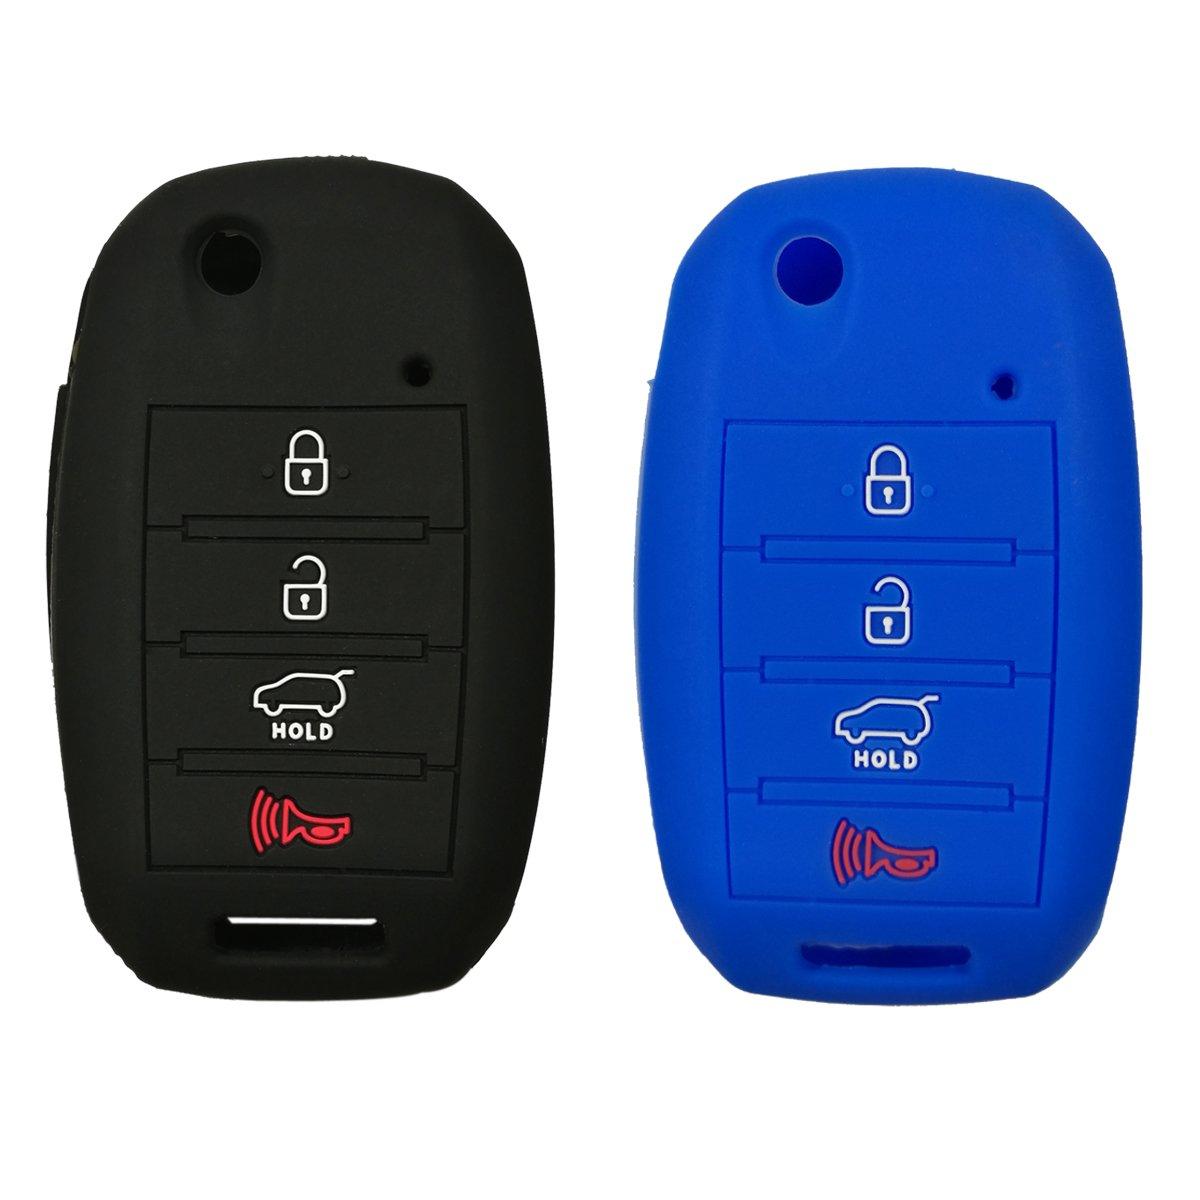 Coolbestda 2Pcs Silicone 4buttons Flip Folding Key Fob Remote Skin Cover Protector Keyless Entry Case for Kia Sorento Sportage Rio Soul Forte Optima Carens Black Blue